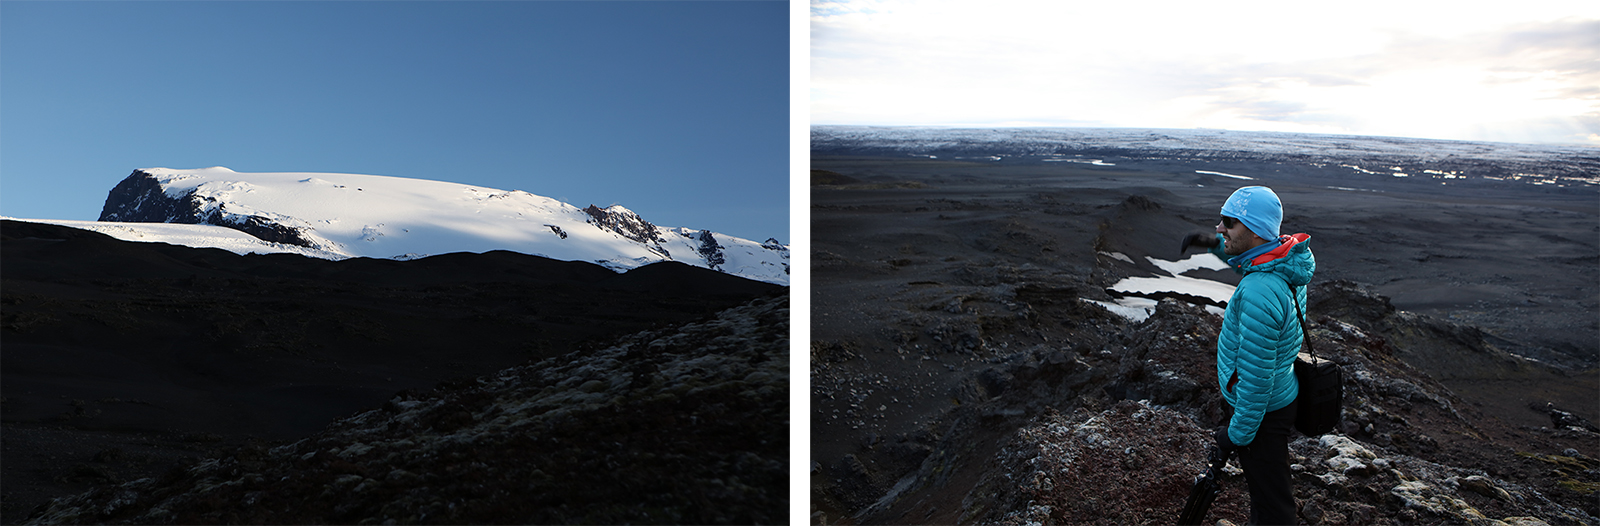 kverkfjoll-mountains